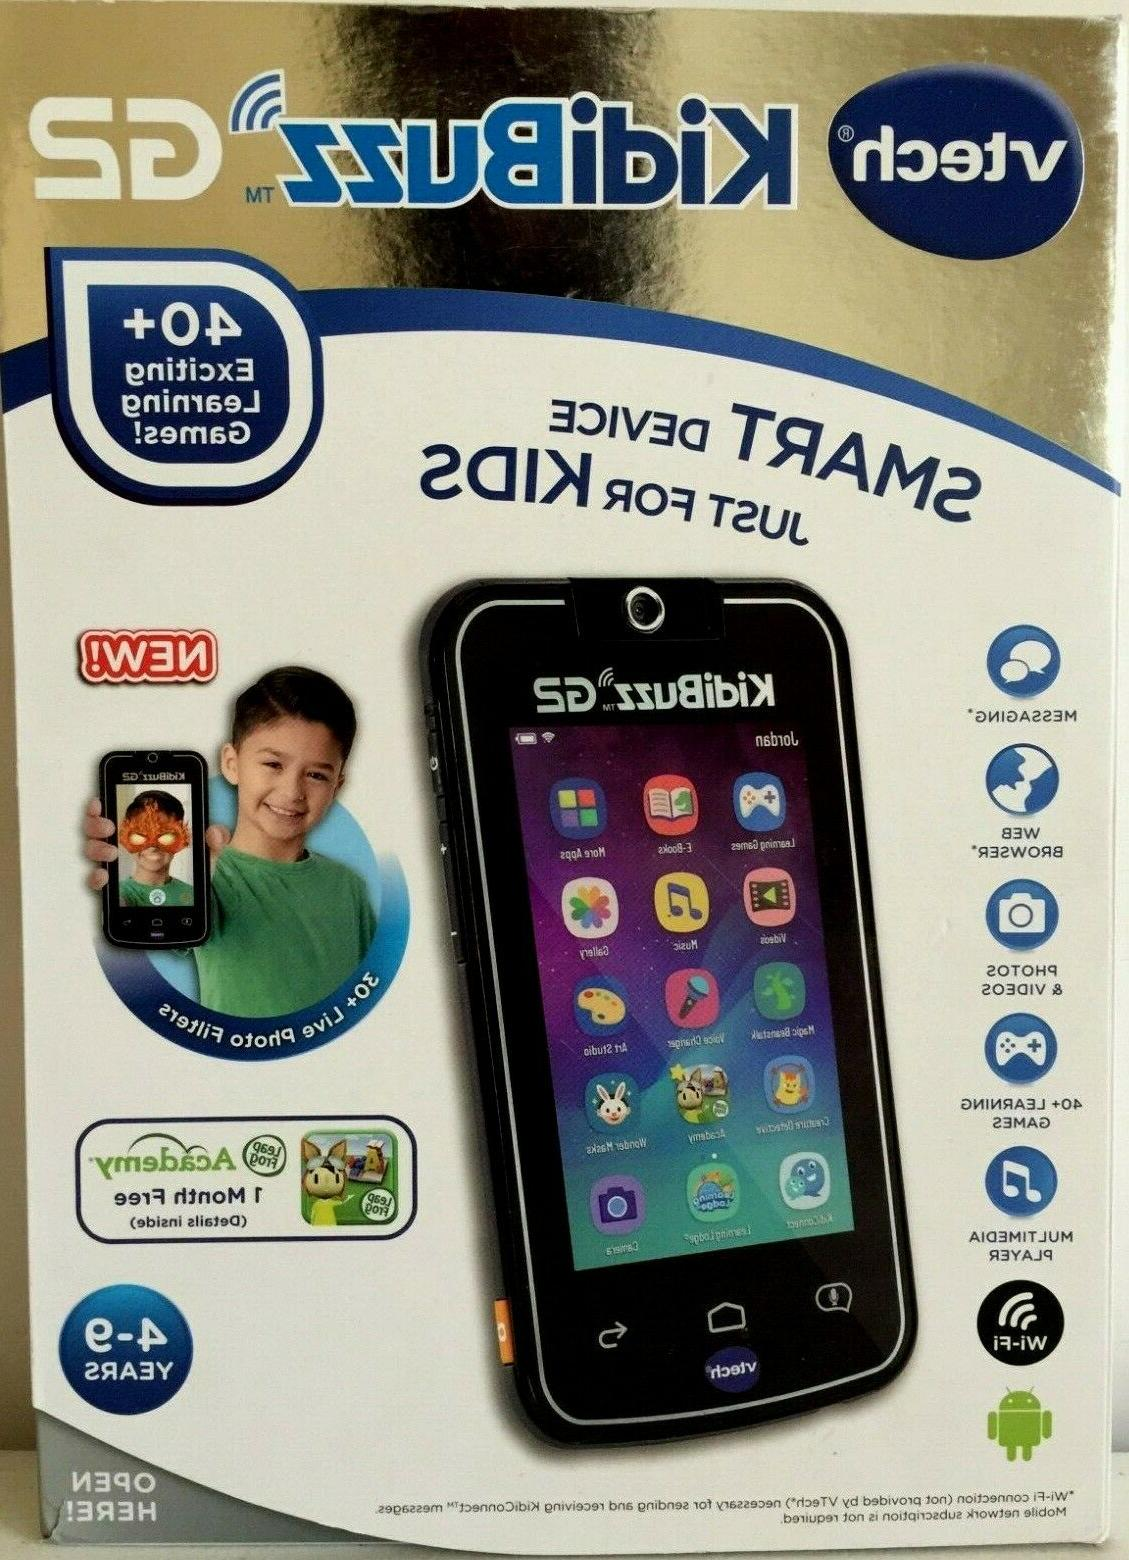 Vtech Smart Device for BRAND SEALED!